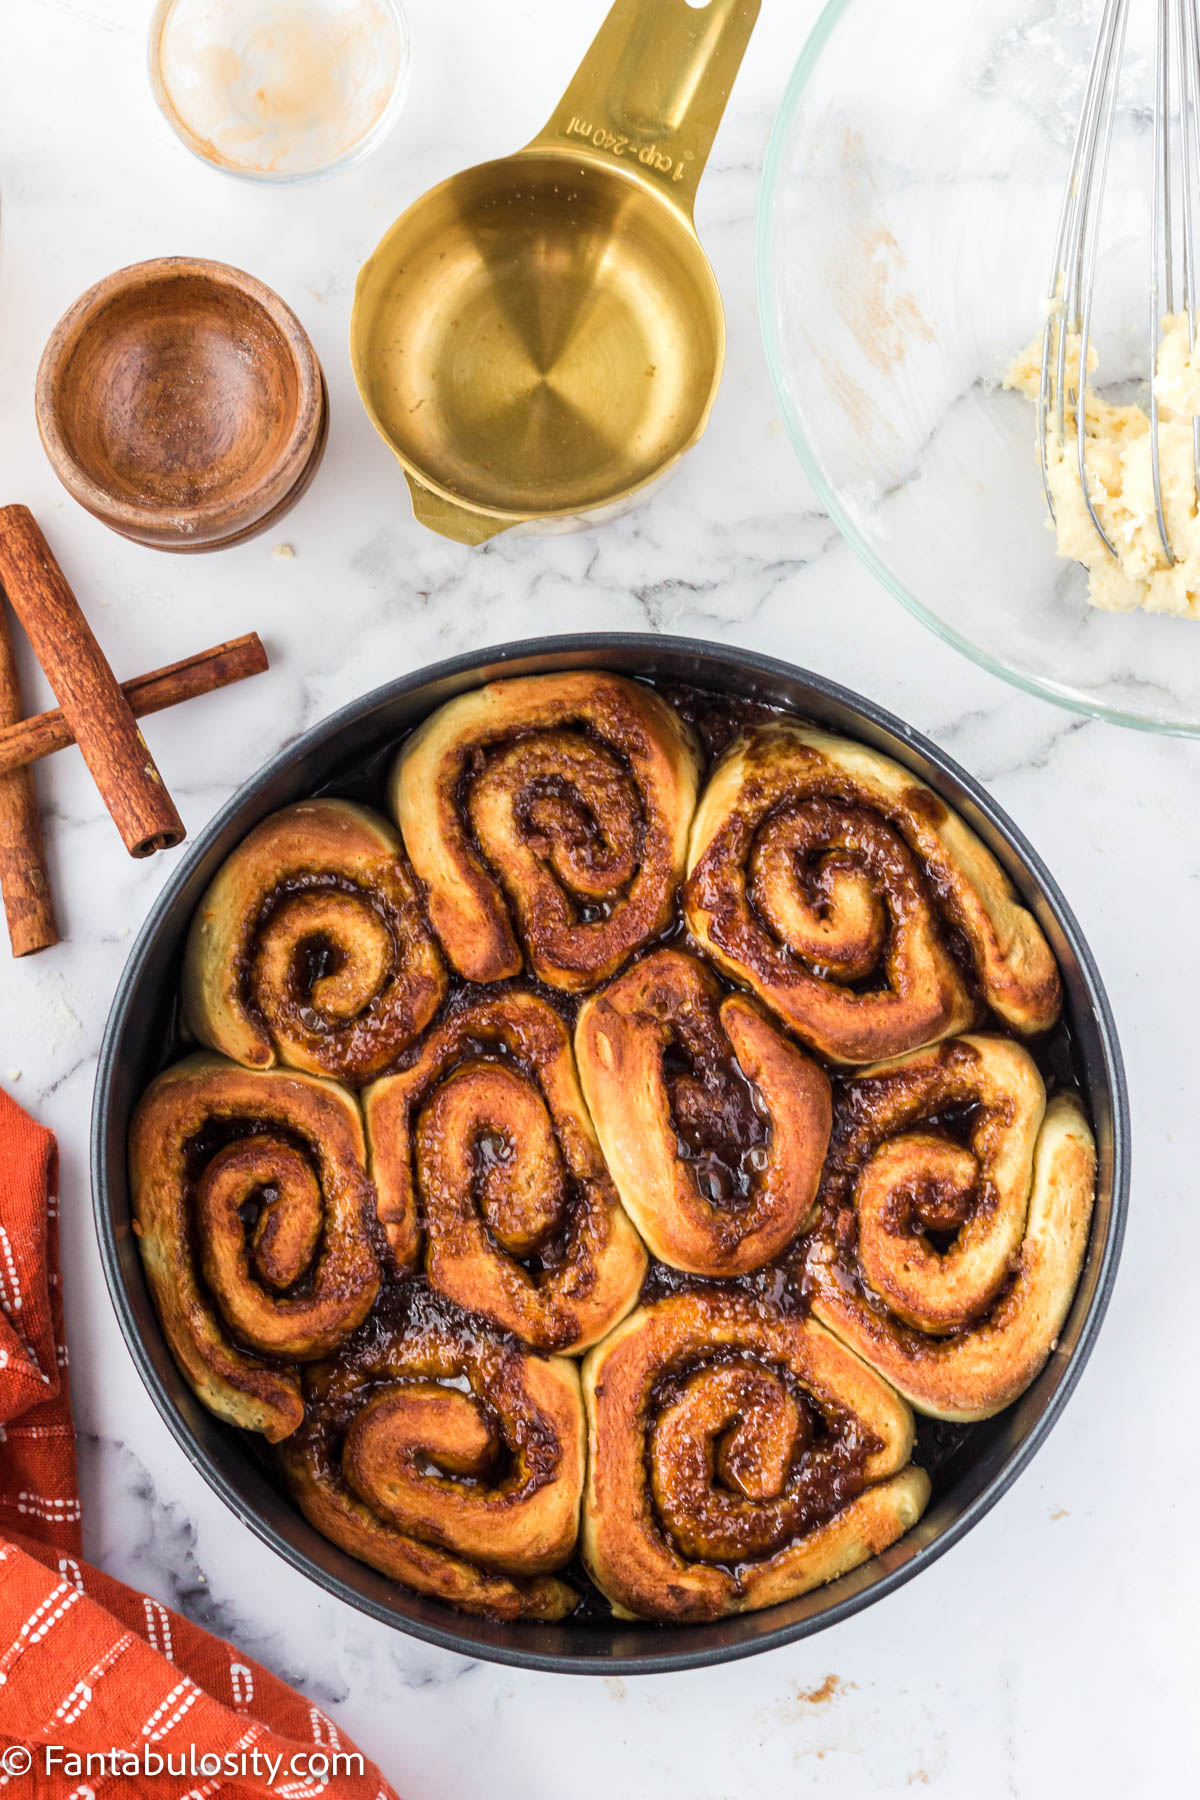 Cooked Air fryer cinnamon rolls